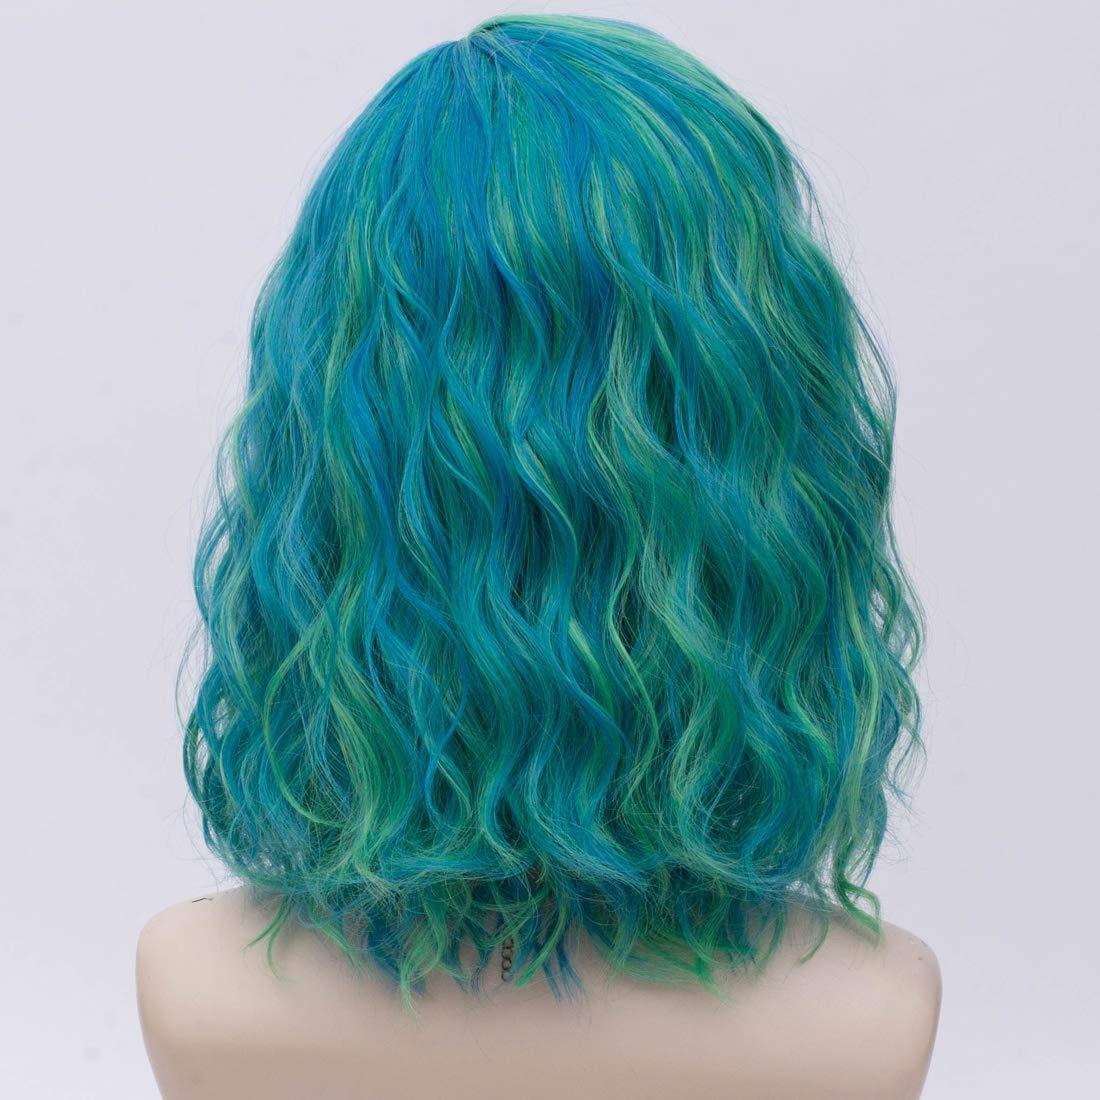 Wig Cap Probeauty Sweety Rainbow Collection Lolita 40CM Short Curly Women Lolita Anime Cosplay Wig